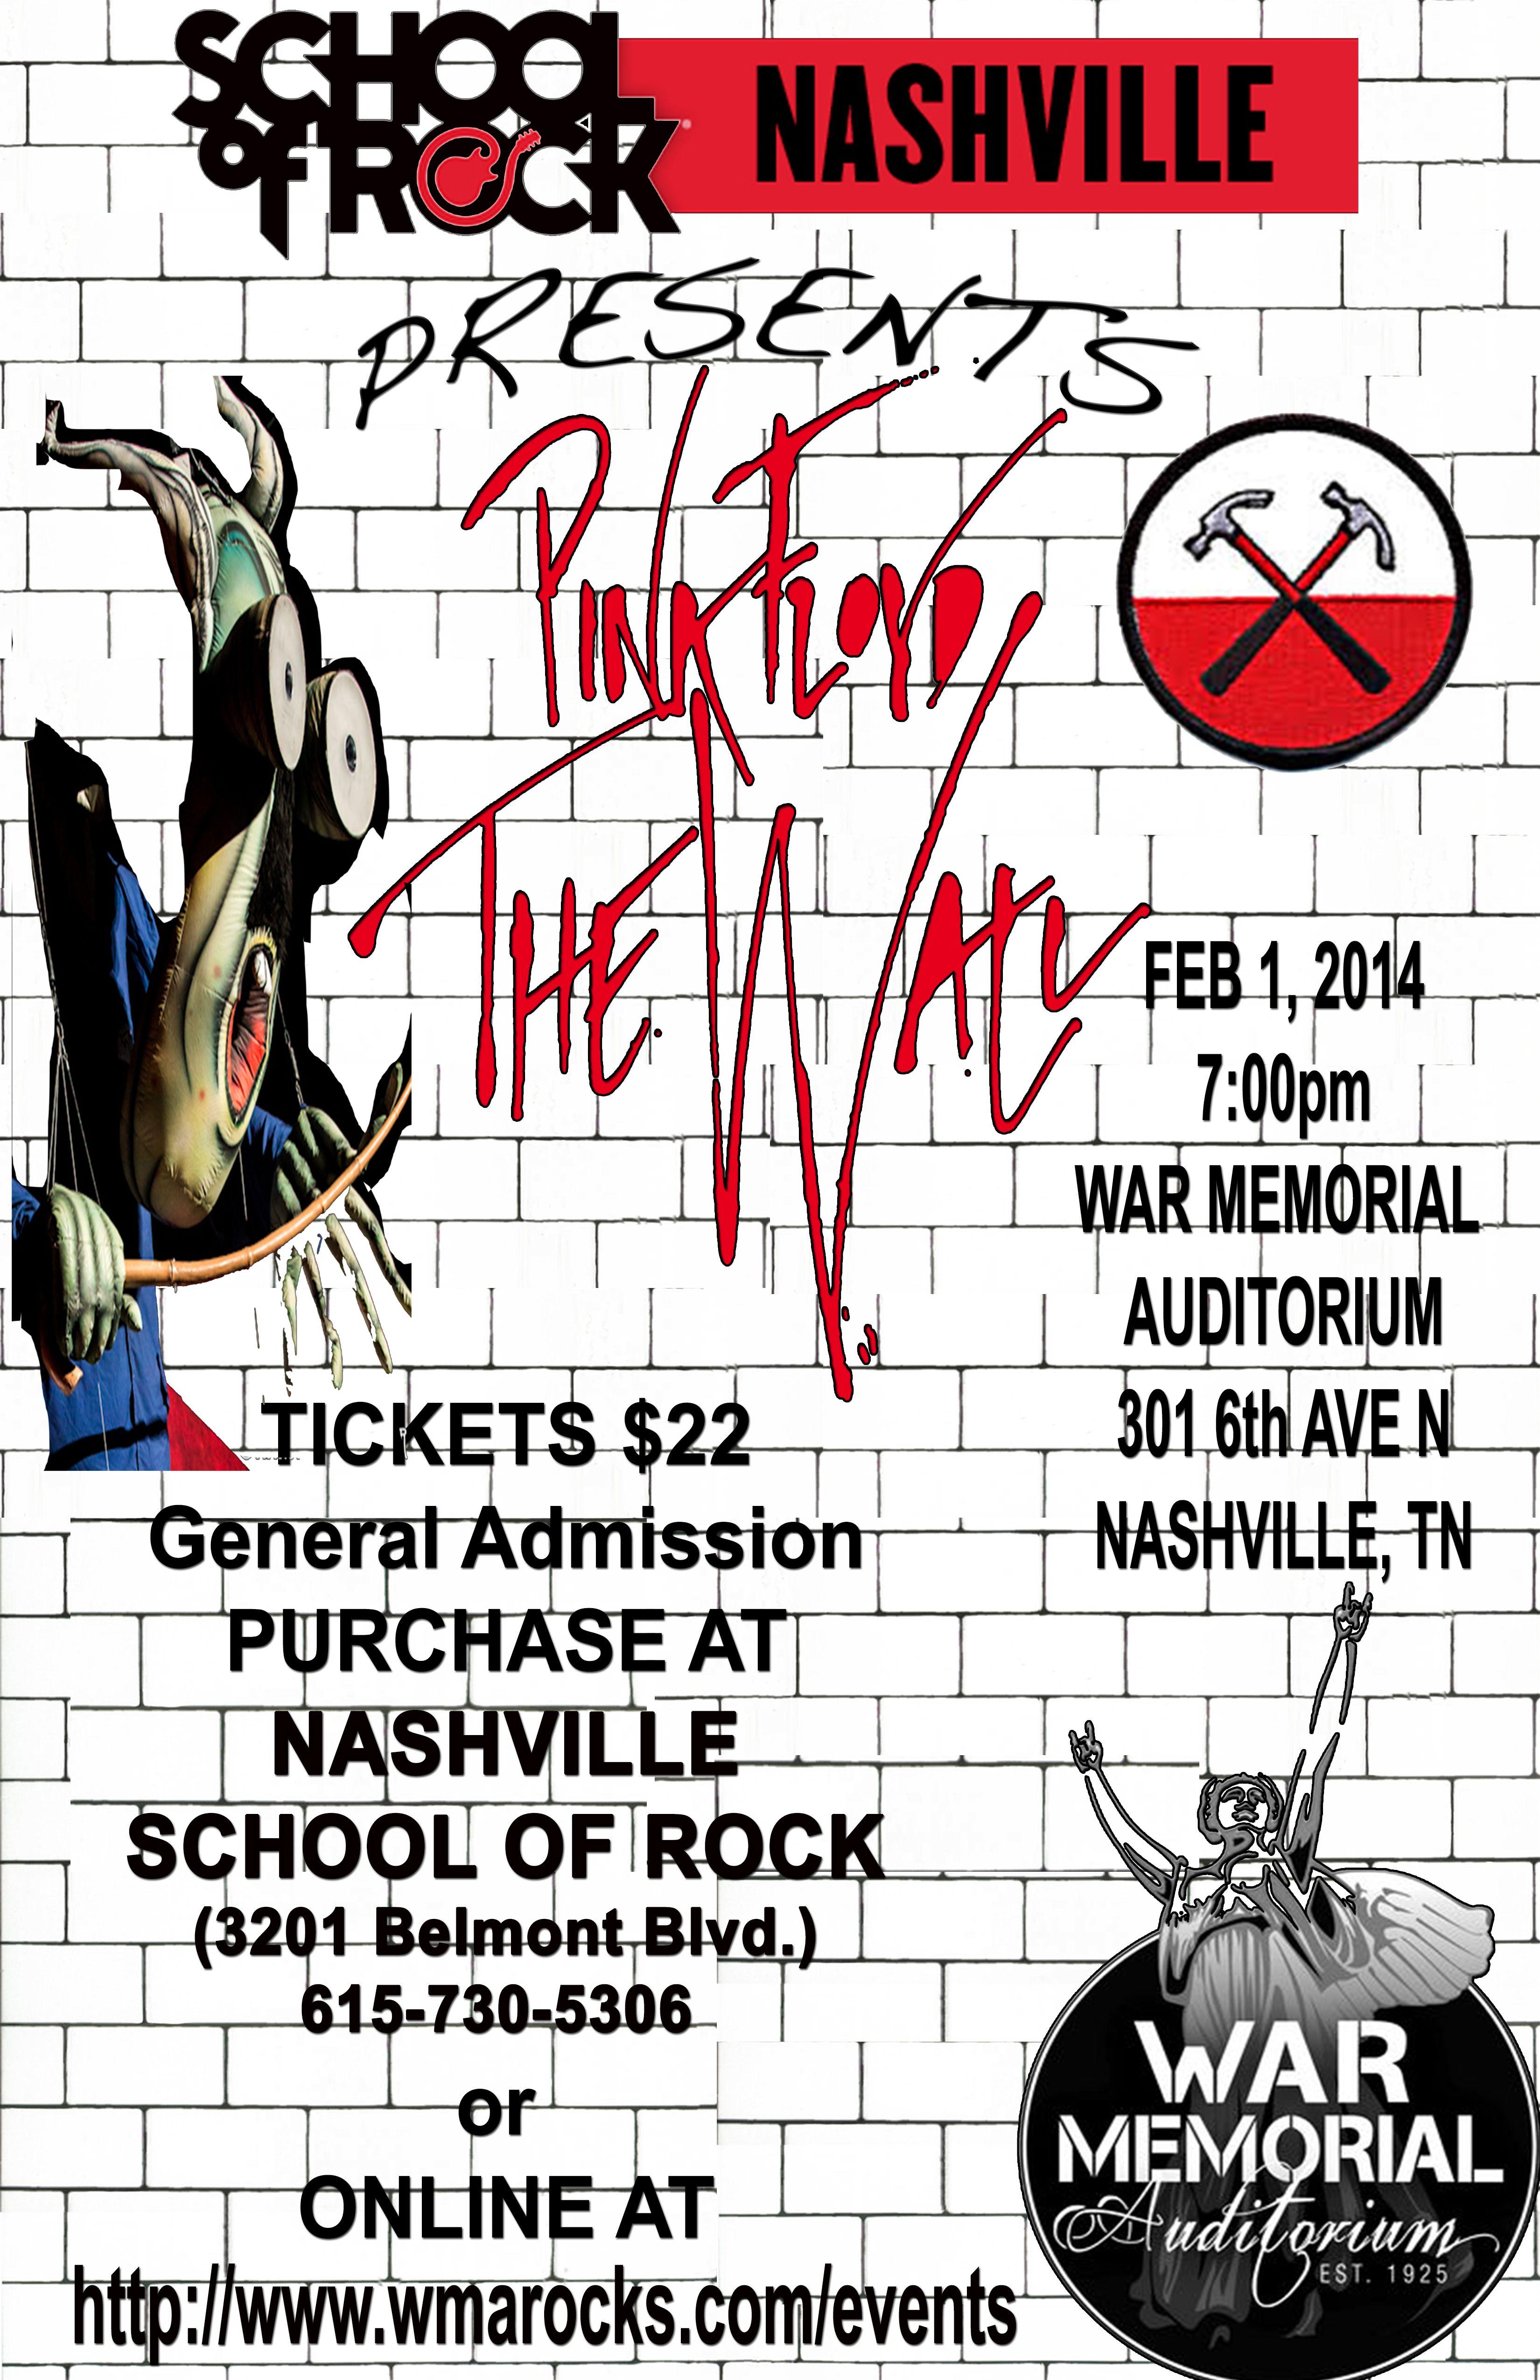 Pin By Angie Mccreight On Franklin And Nashville School Of Rock School Of Rock War Memorial School